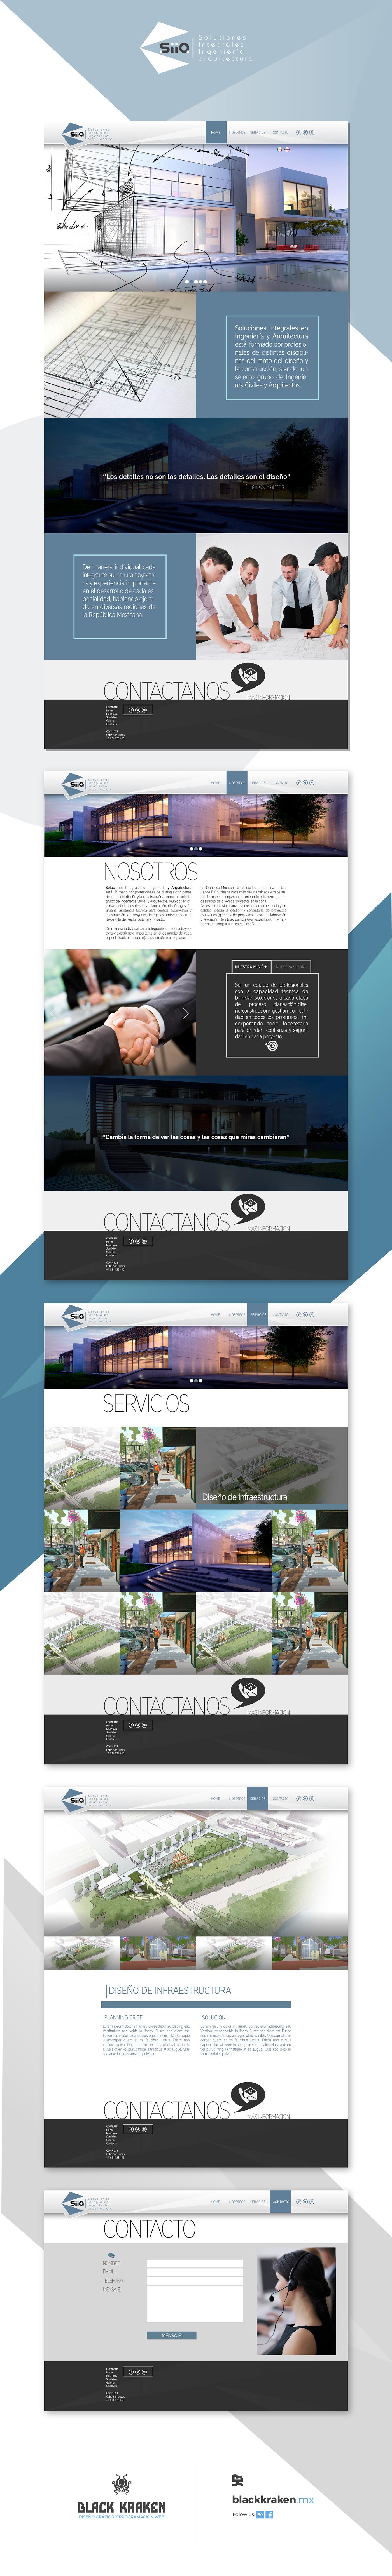 Web development DesignWeb design architect